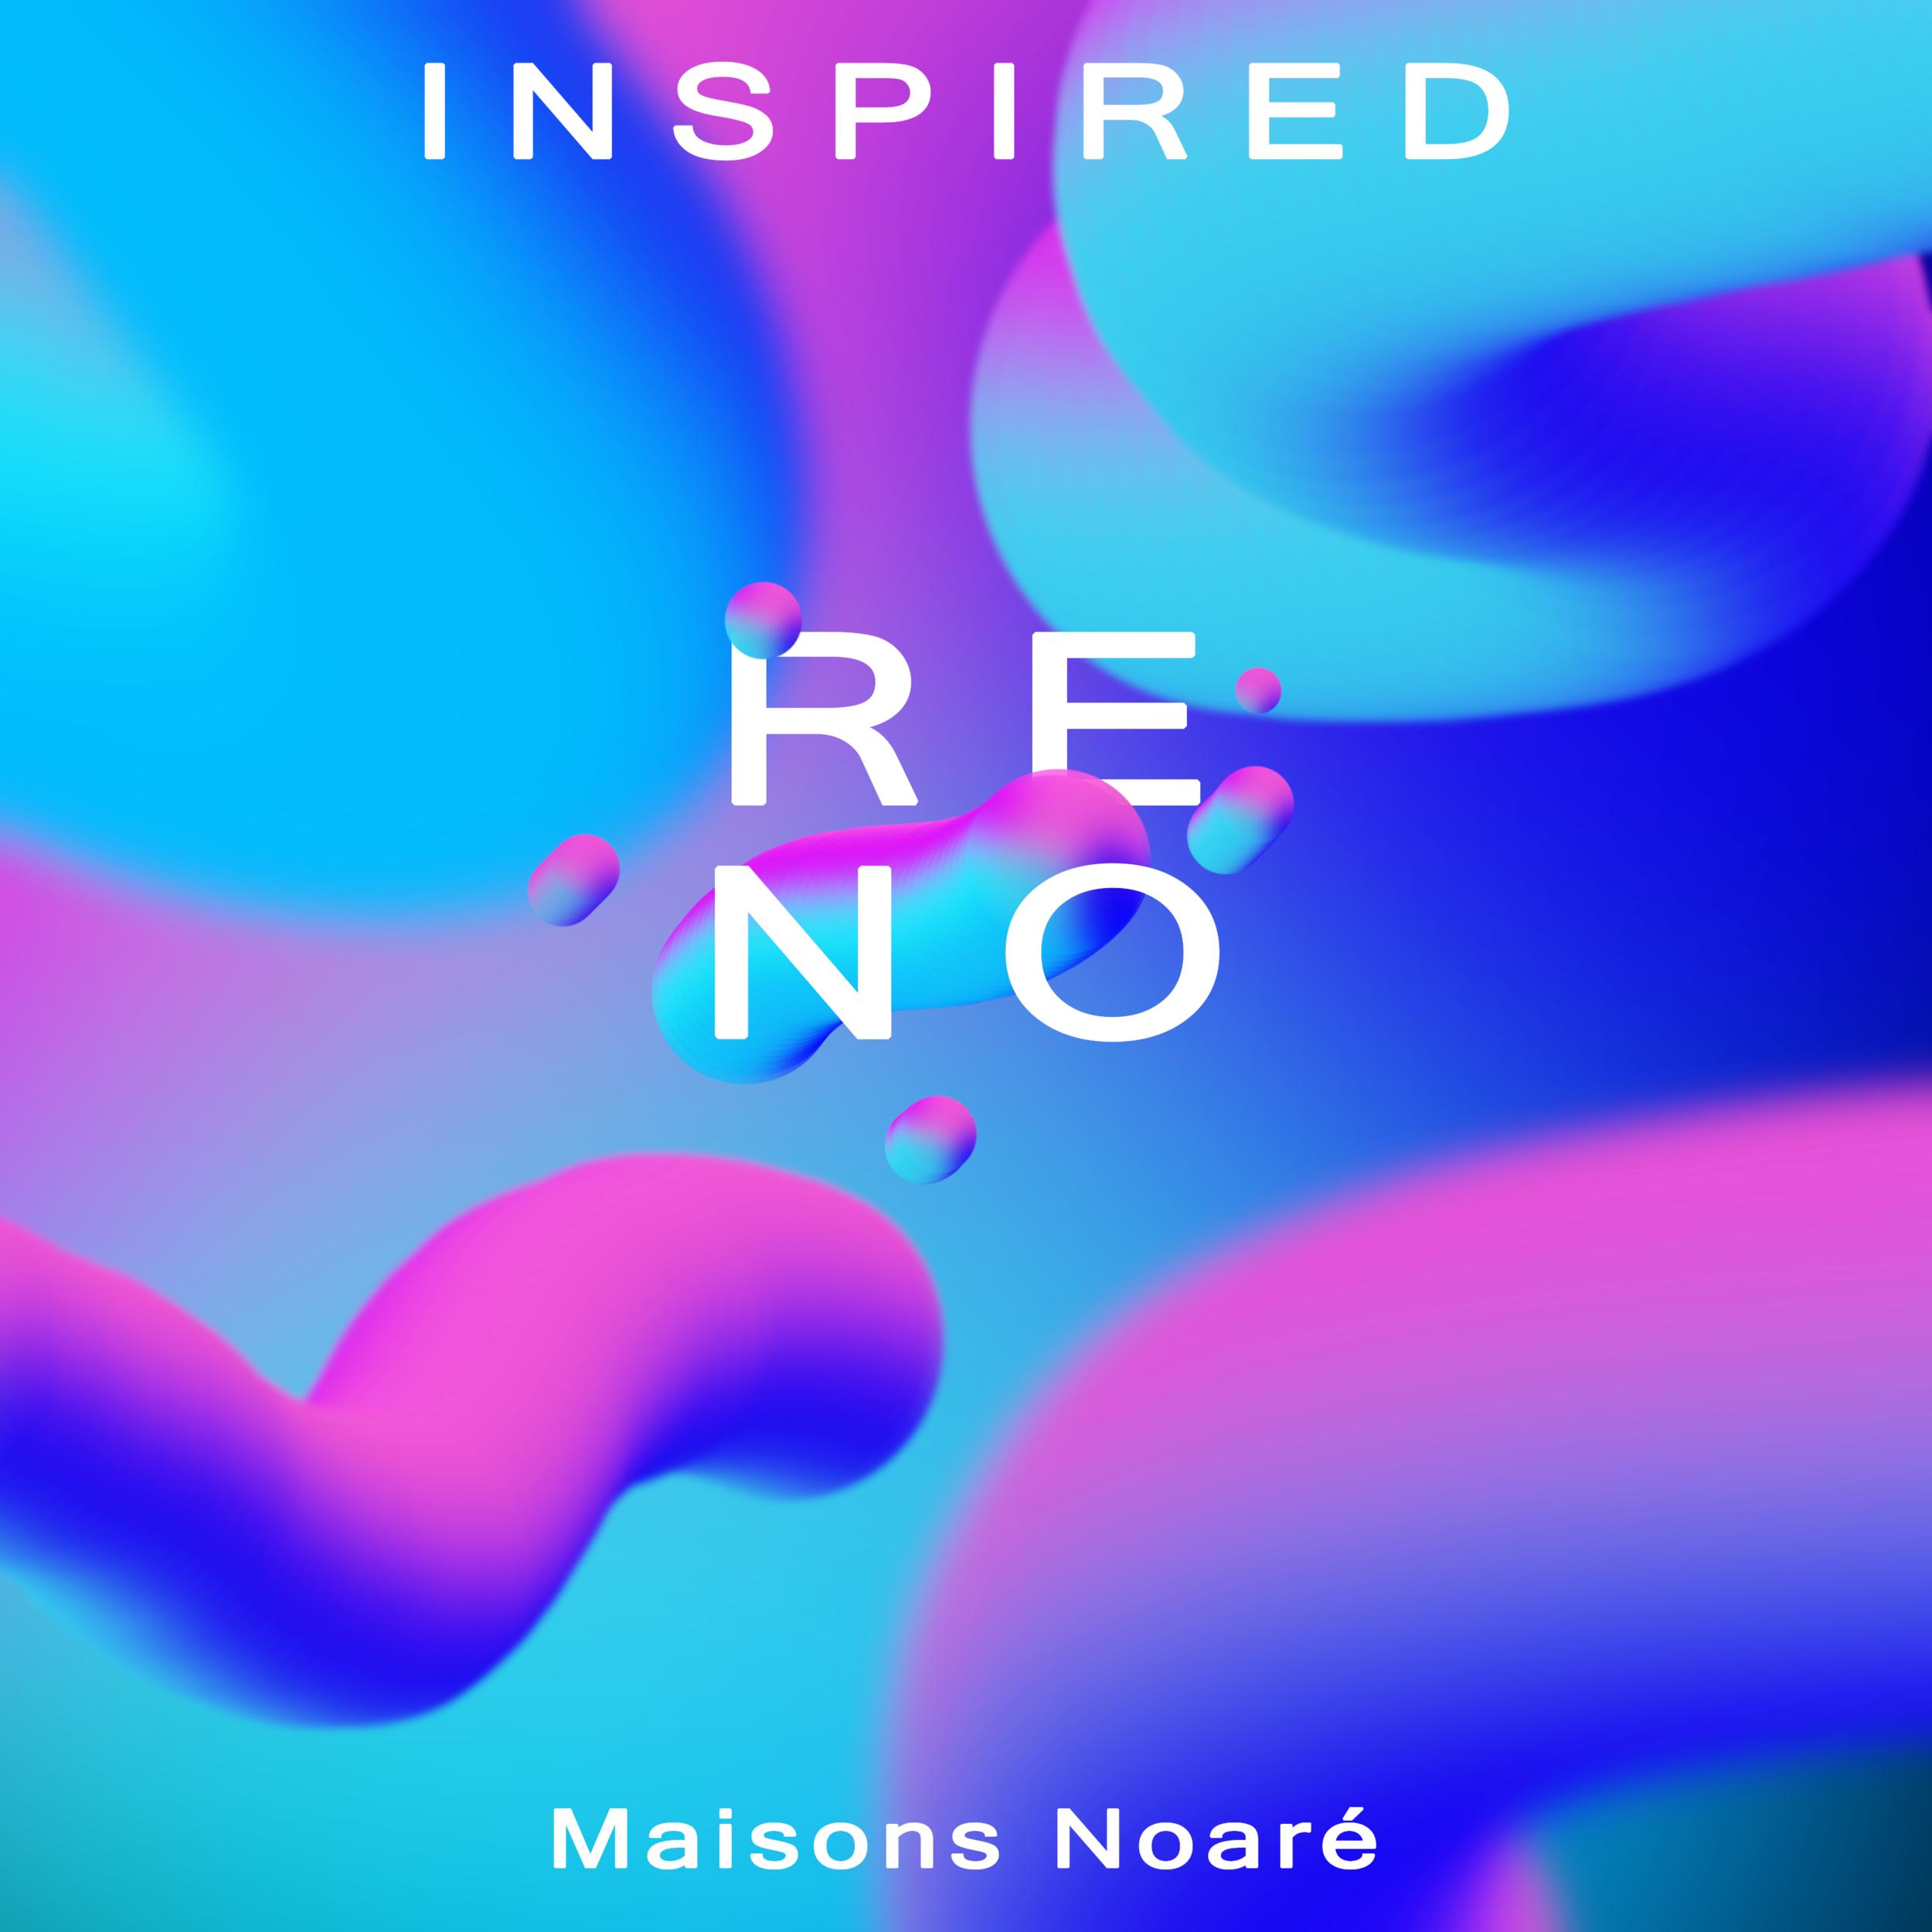 Reno - Inspired (Single)